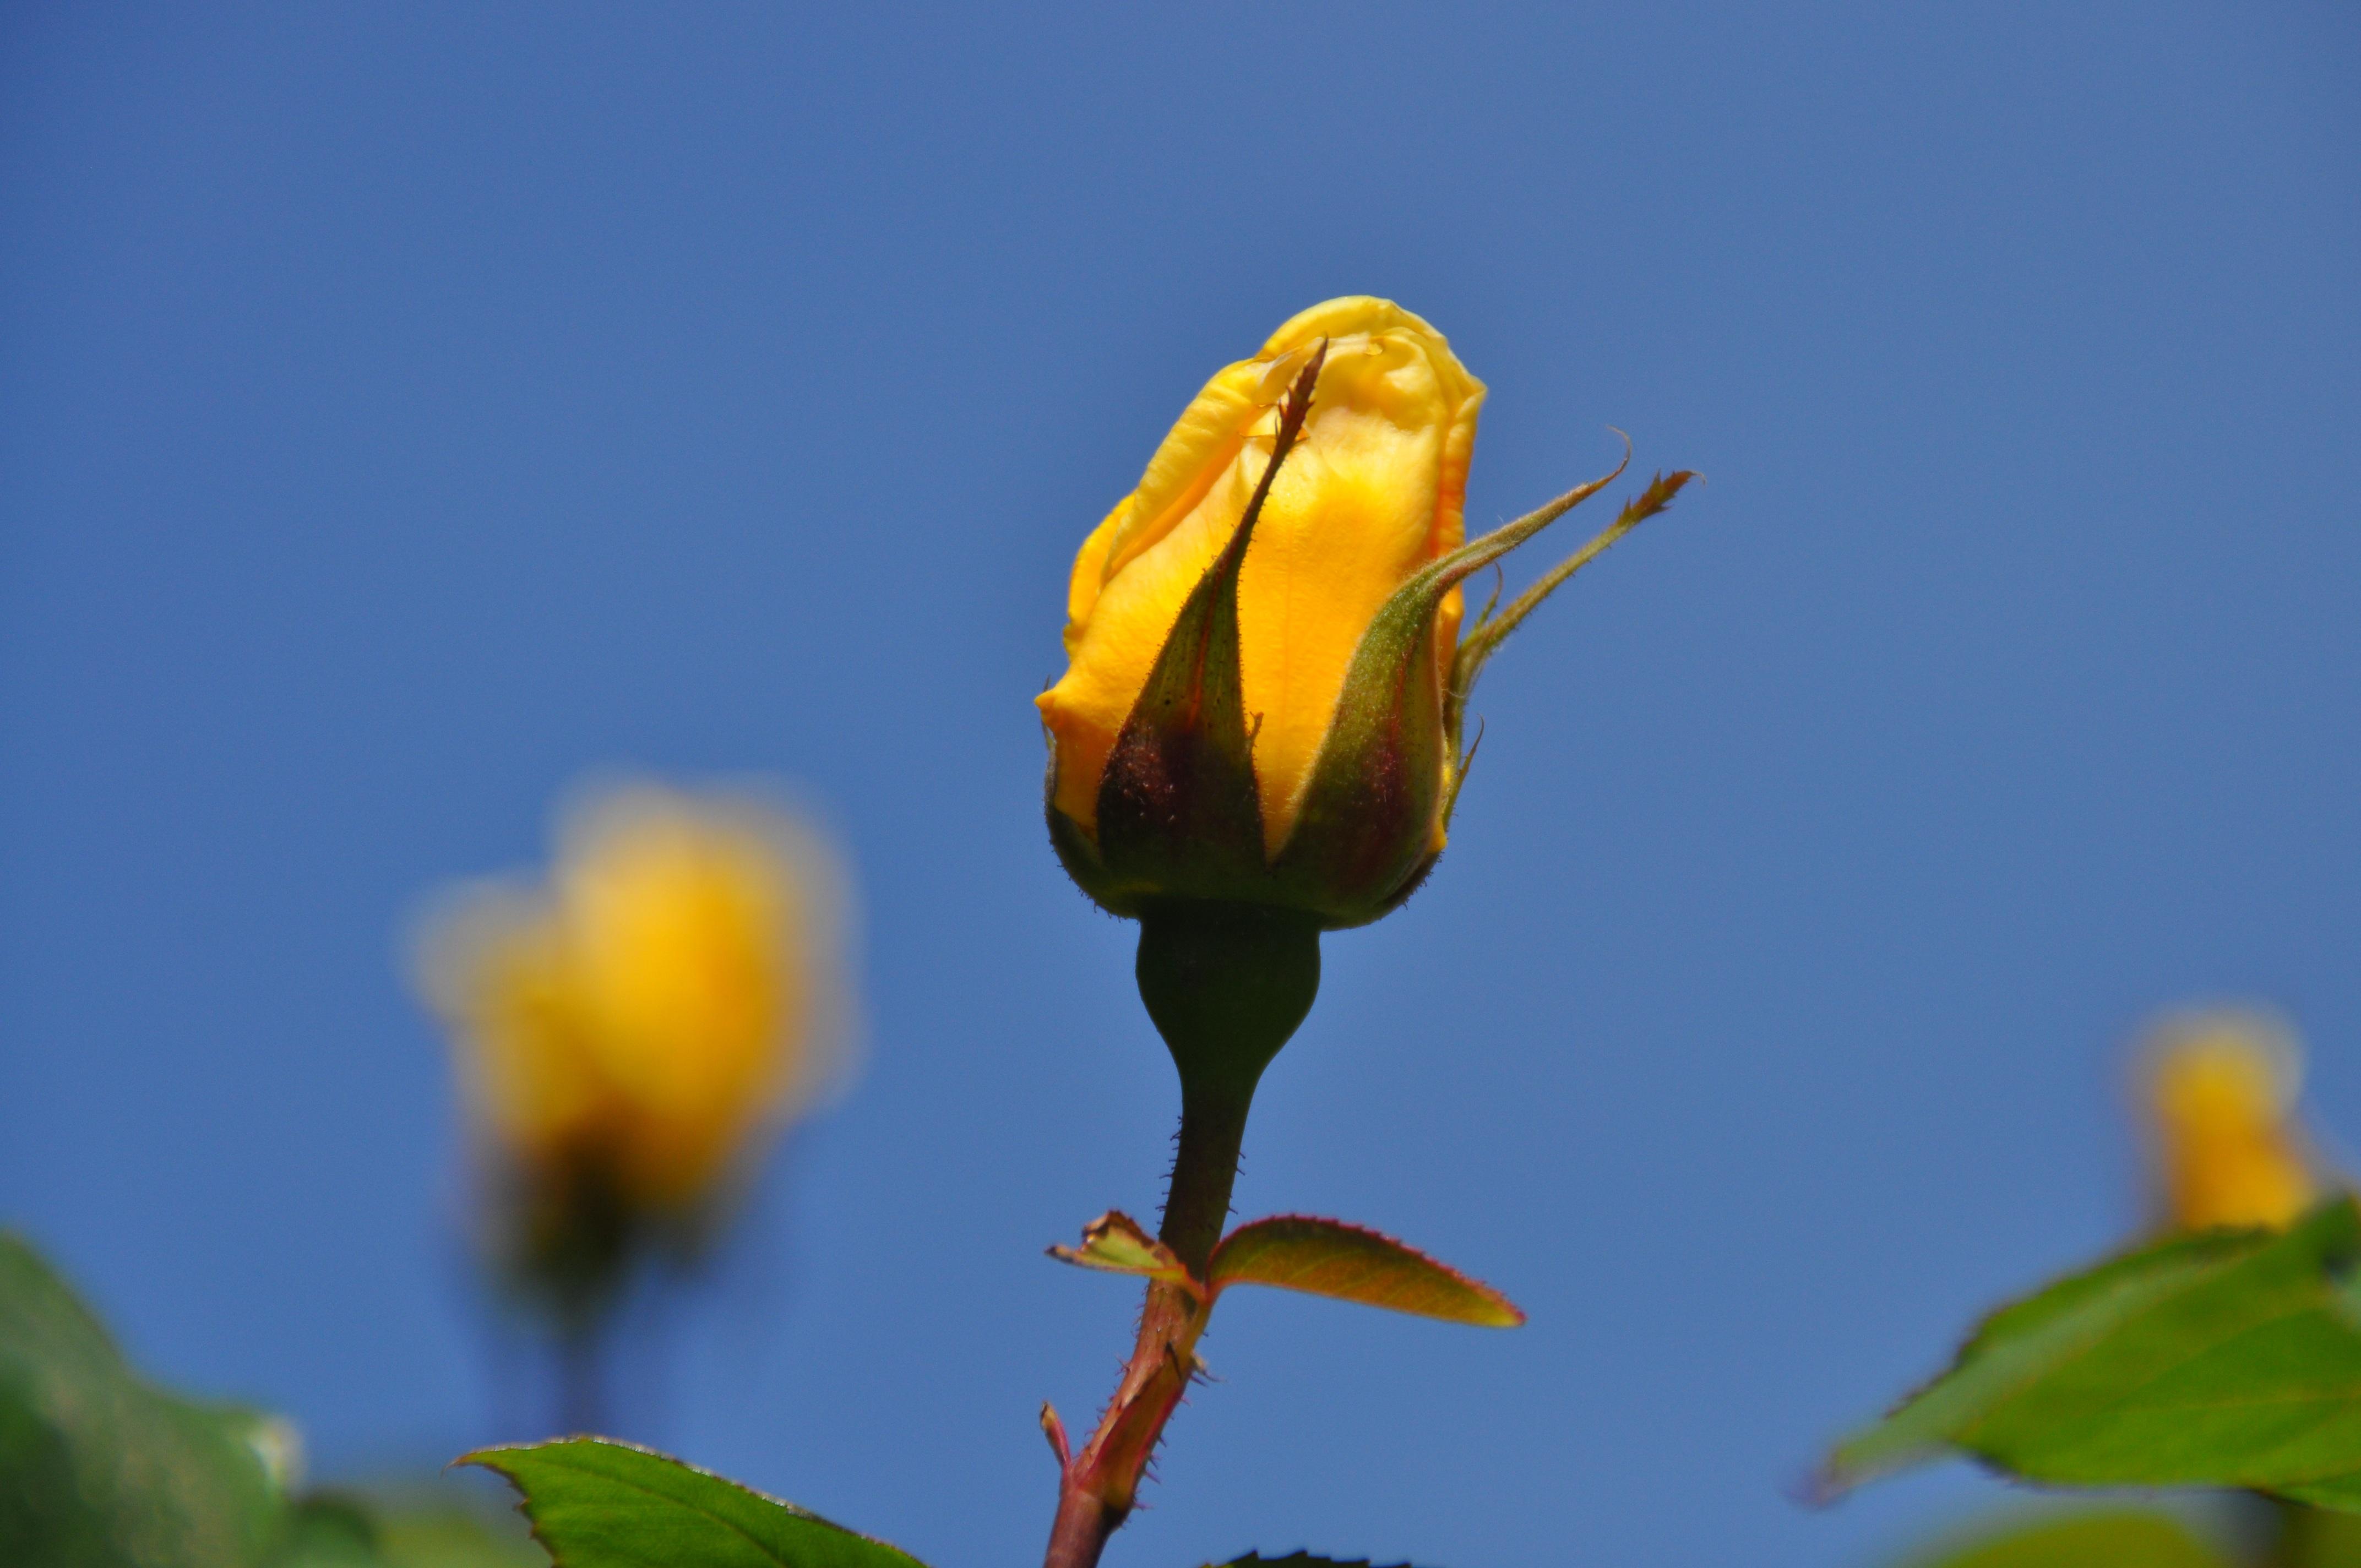 Free Images Nature Blossom Leaf Petal Romantic Botany Flora